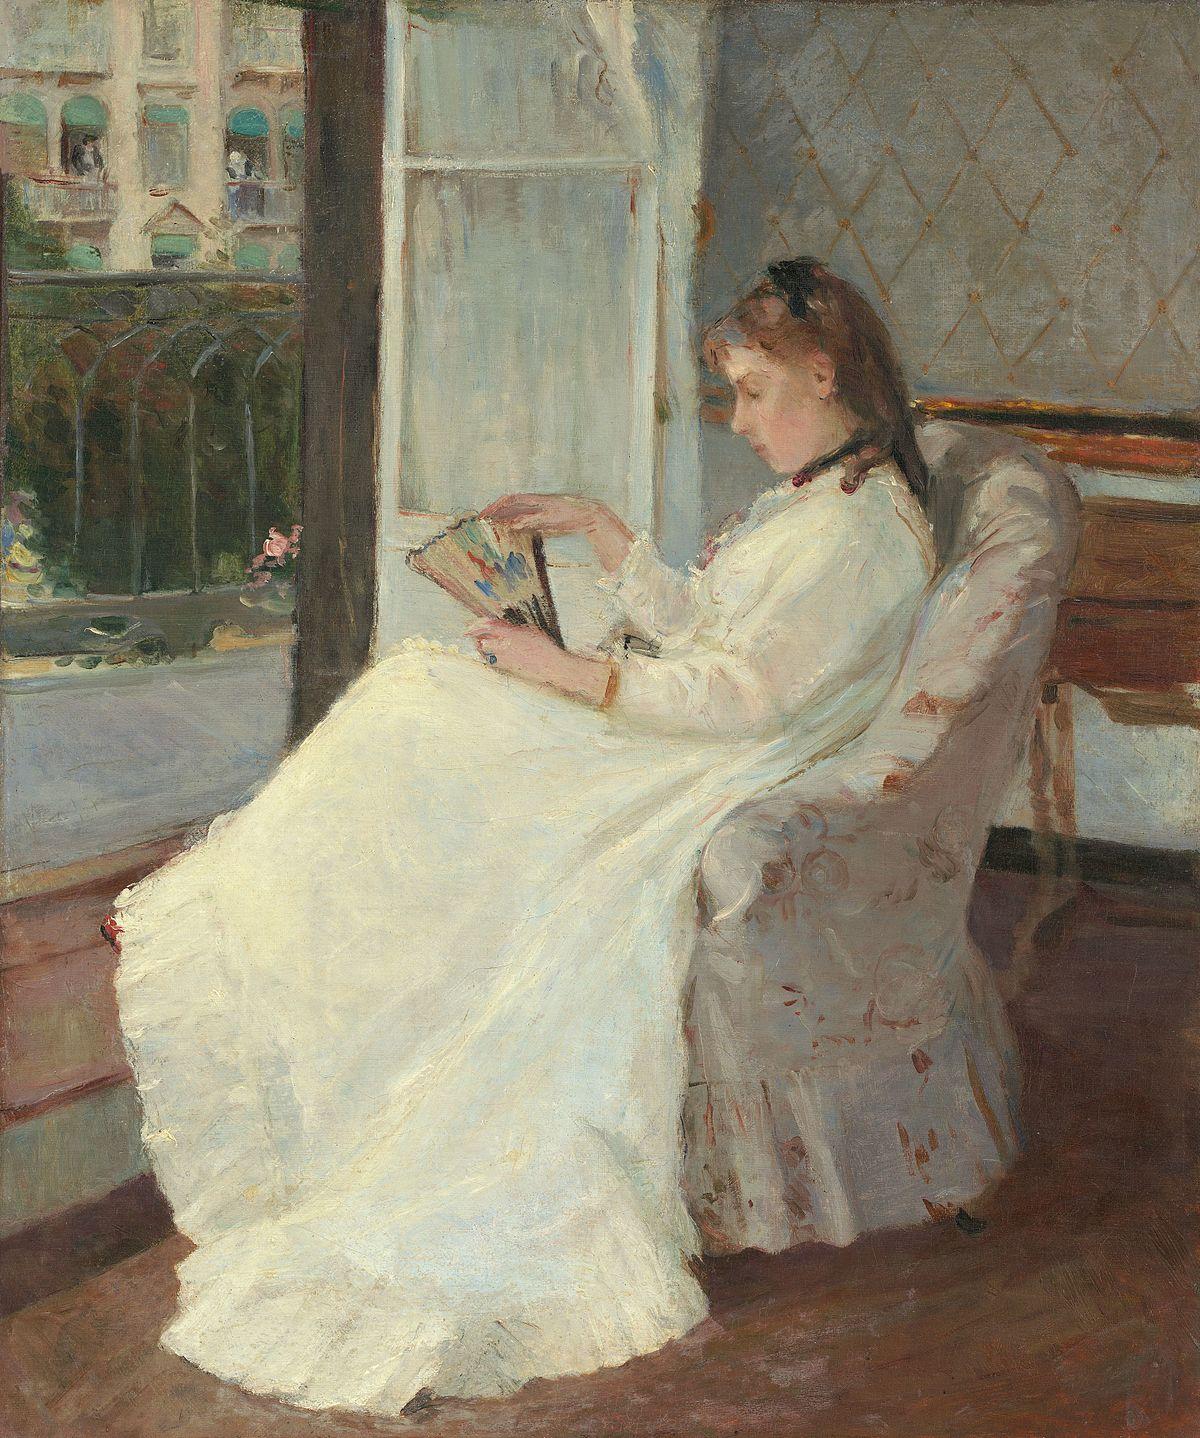 File:The Artist's Sister at a Window A16570.jpg - 维基百科,自由的百科全书